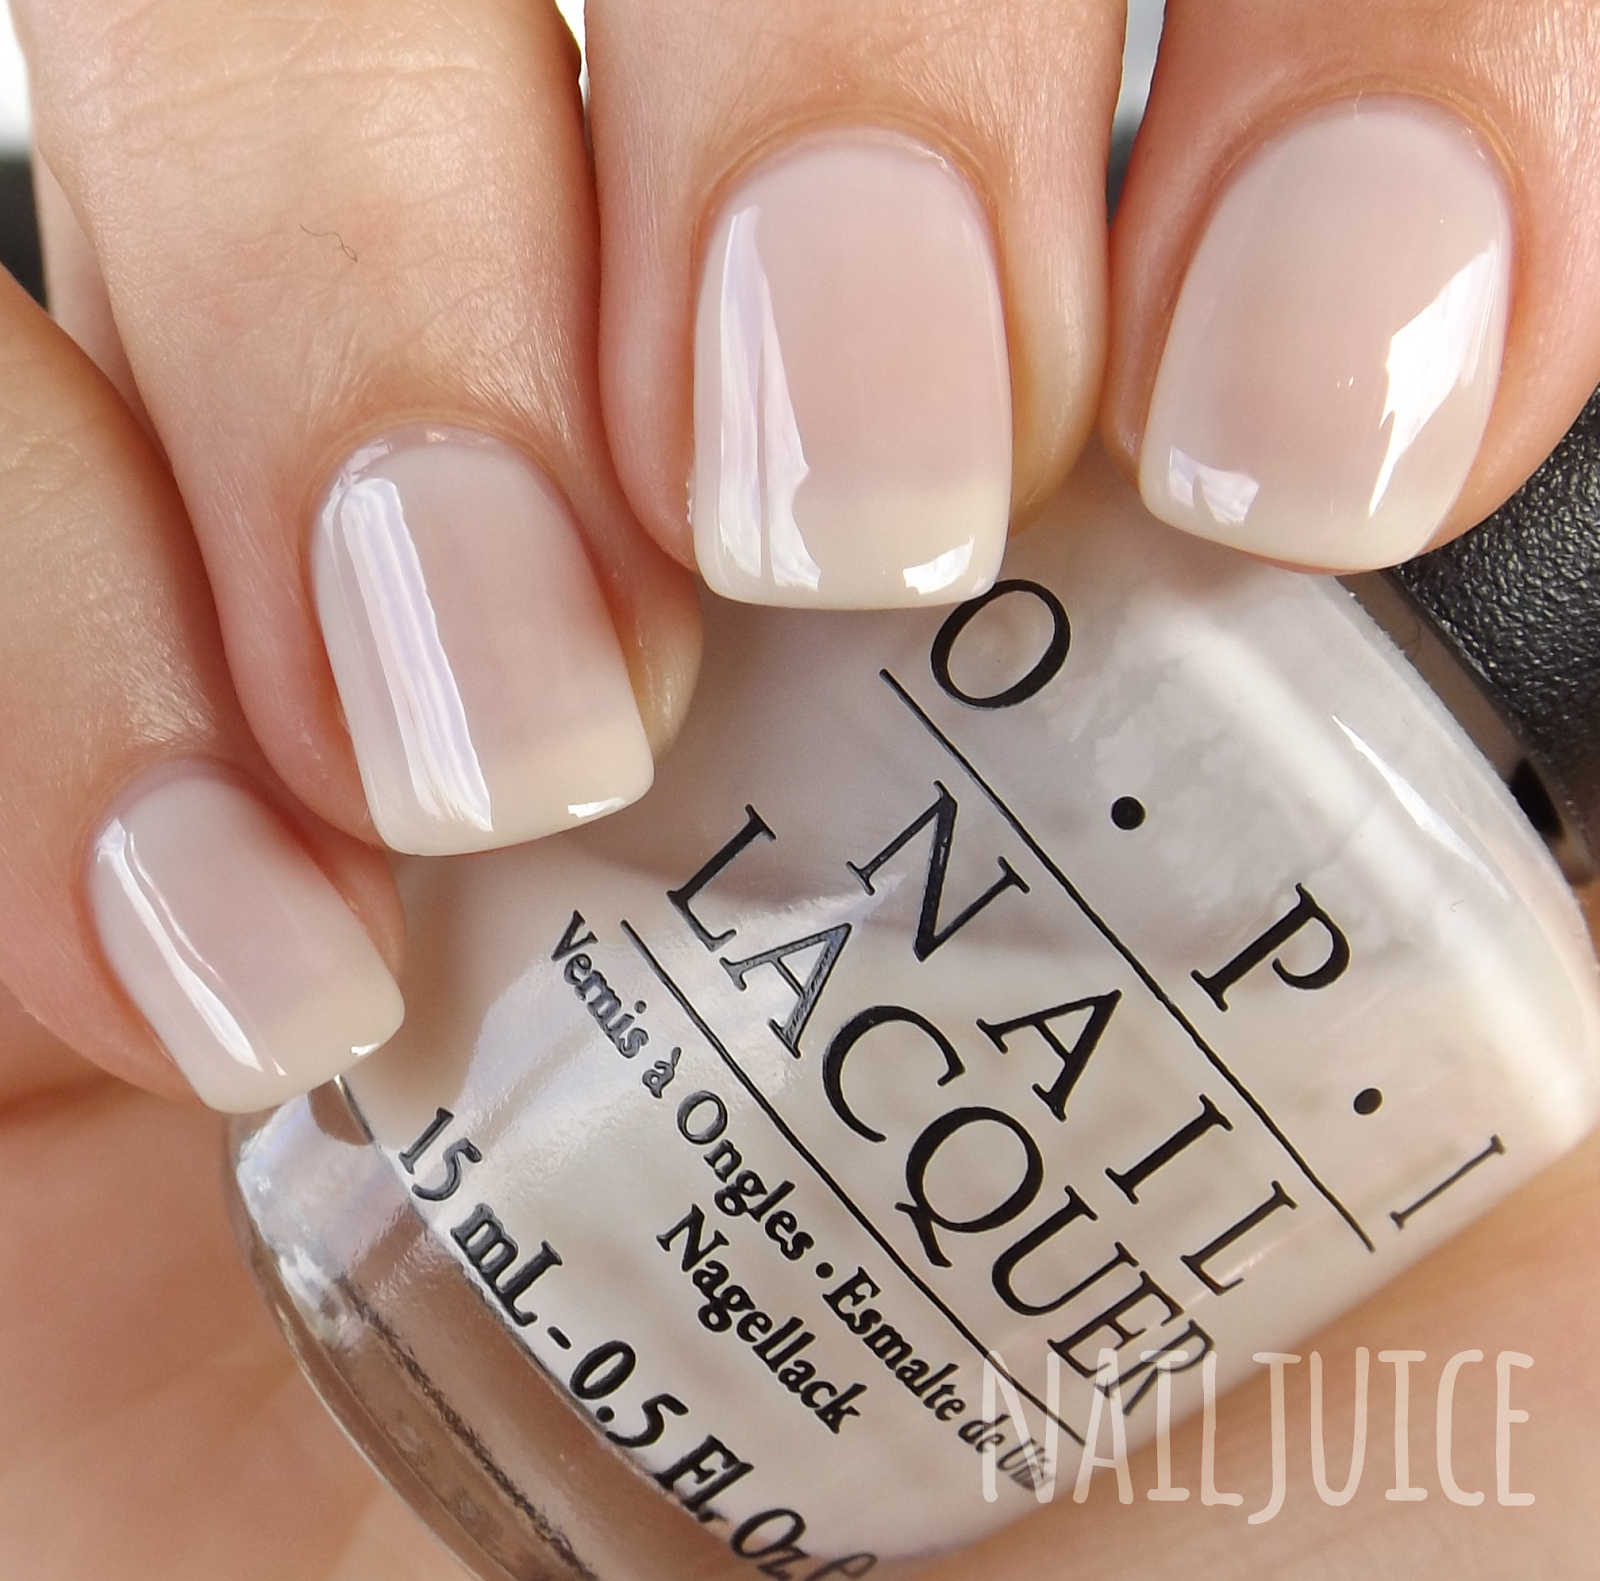 Nail juice is all about nail polish nail care and nail art we nail juice is all about nail polish nail care and nail art we also prinsesfo Gallery